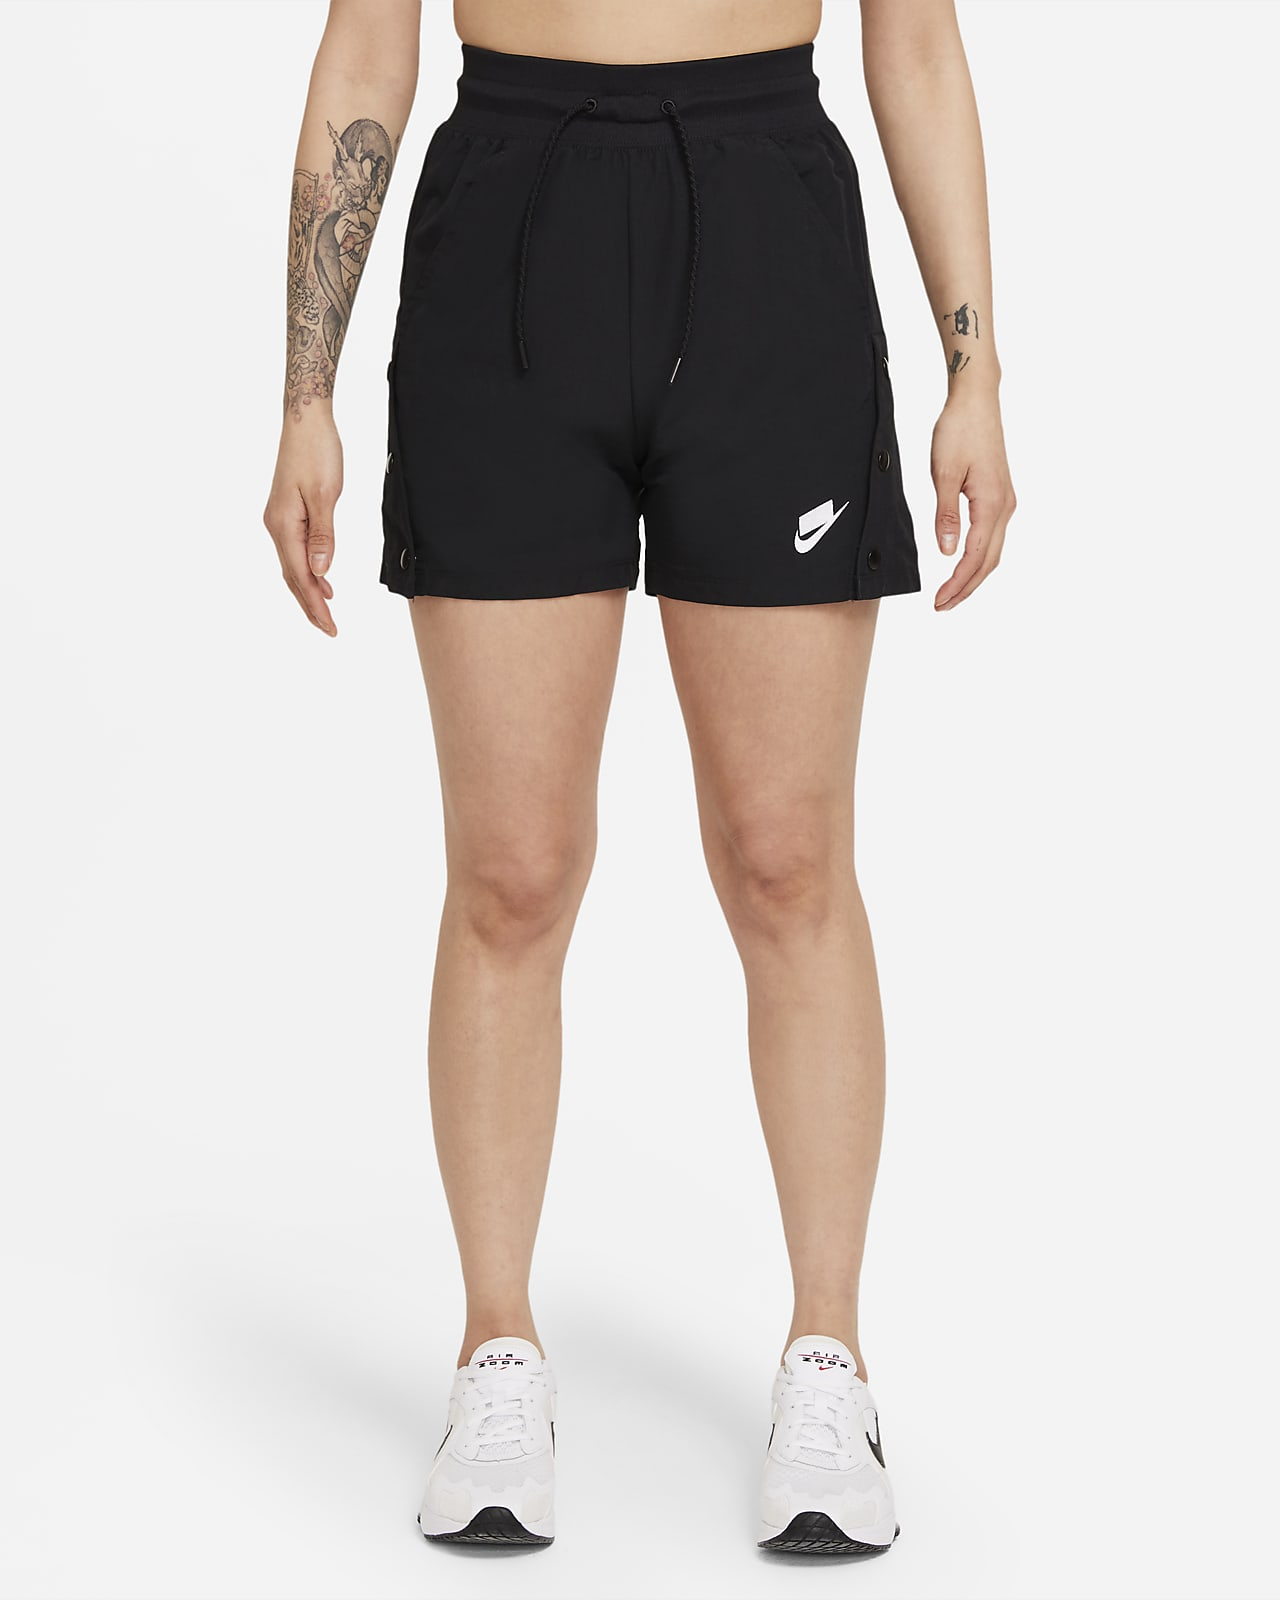 Nike Sportswear NSW 女子短裤